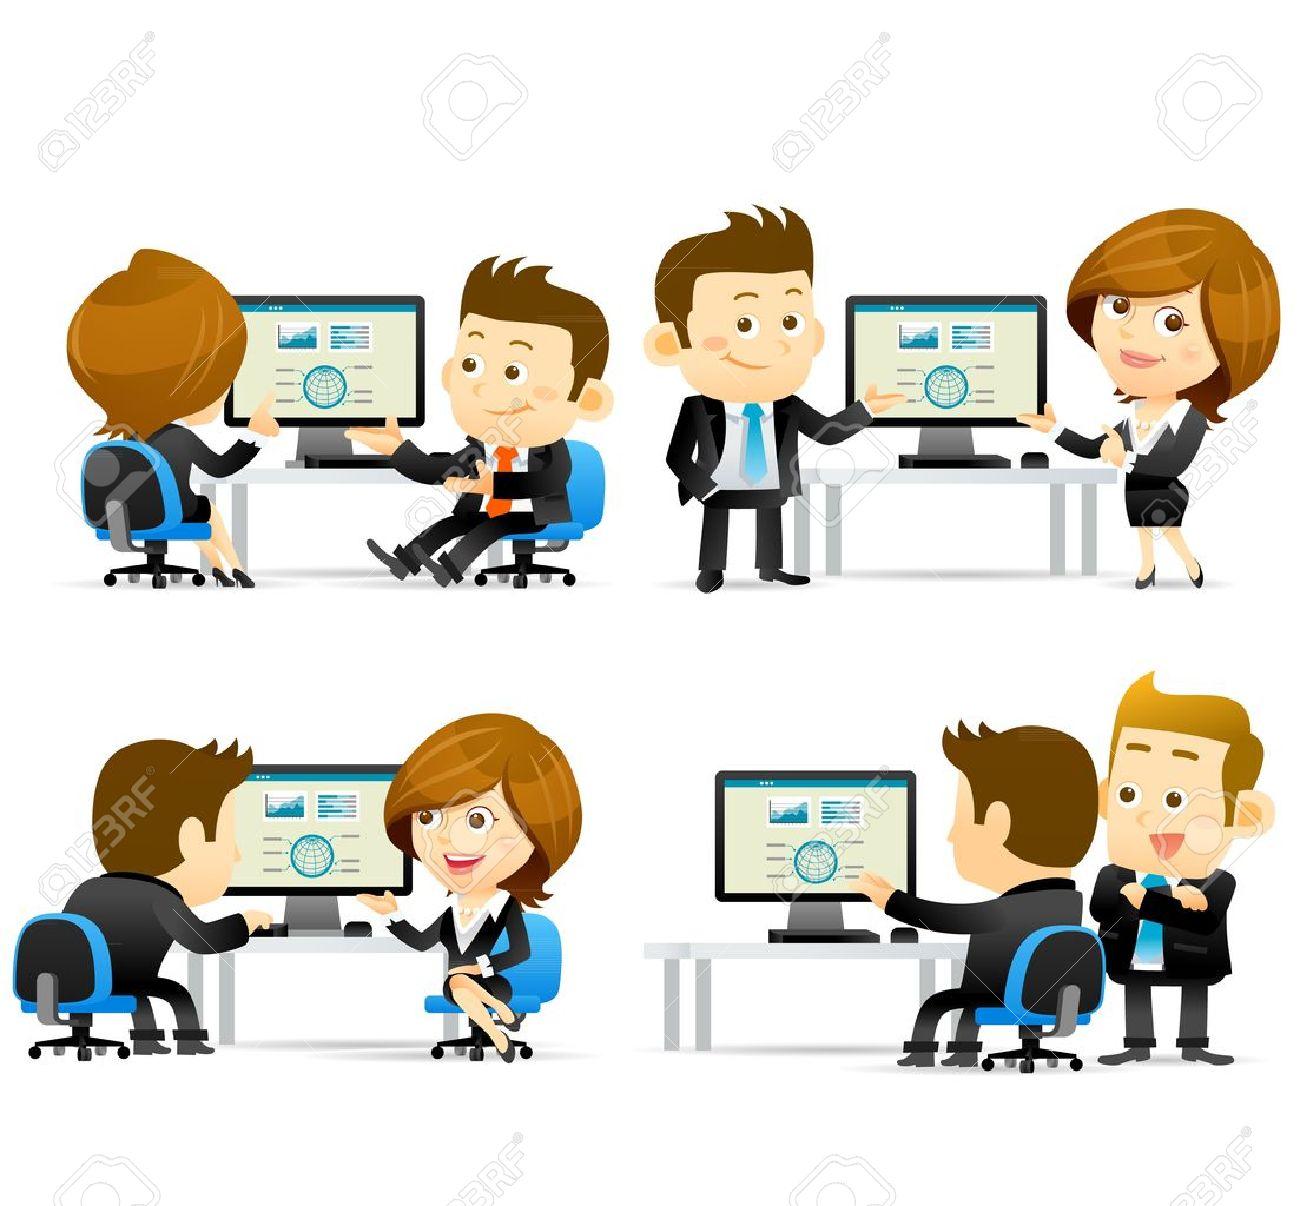 Elegant People Series -Businesspeople at computer - 16856353